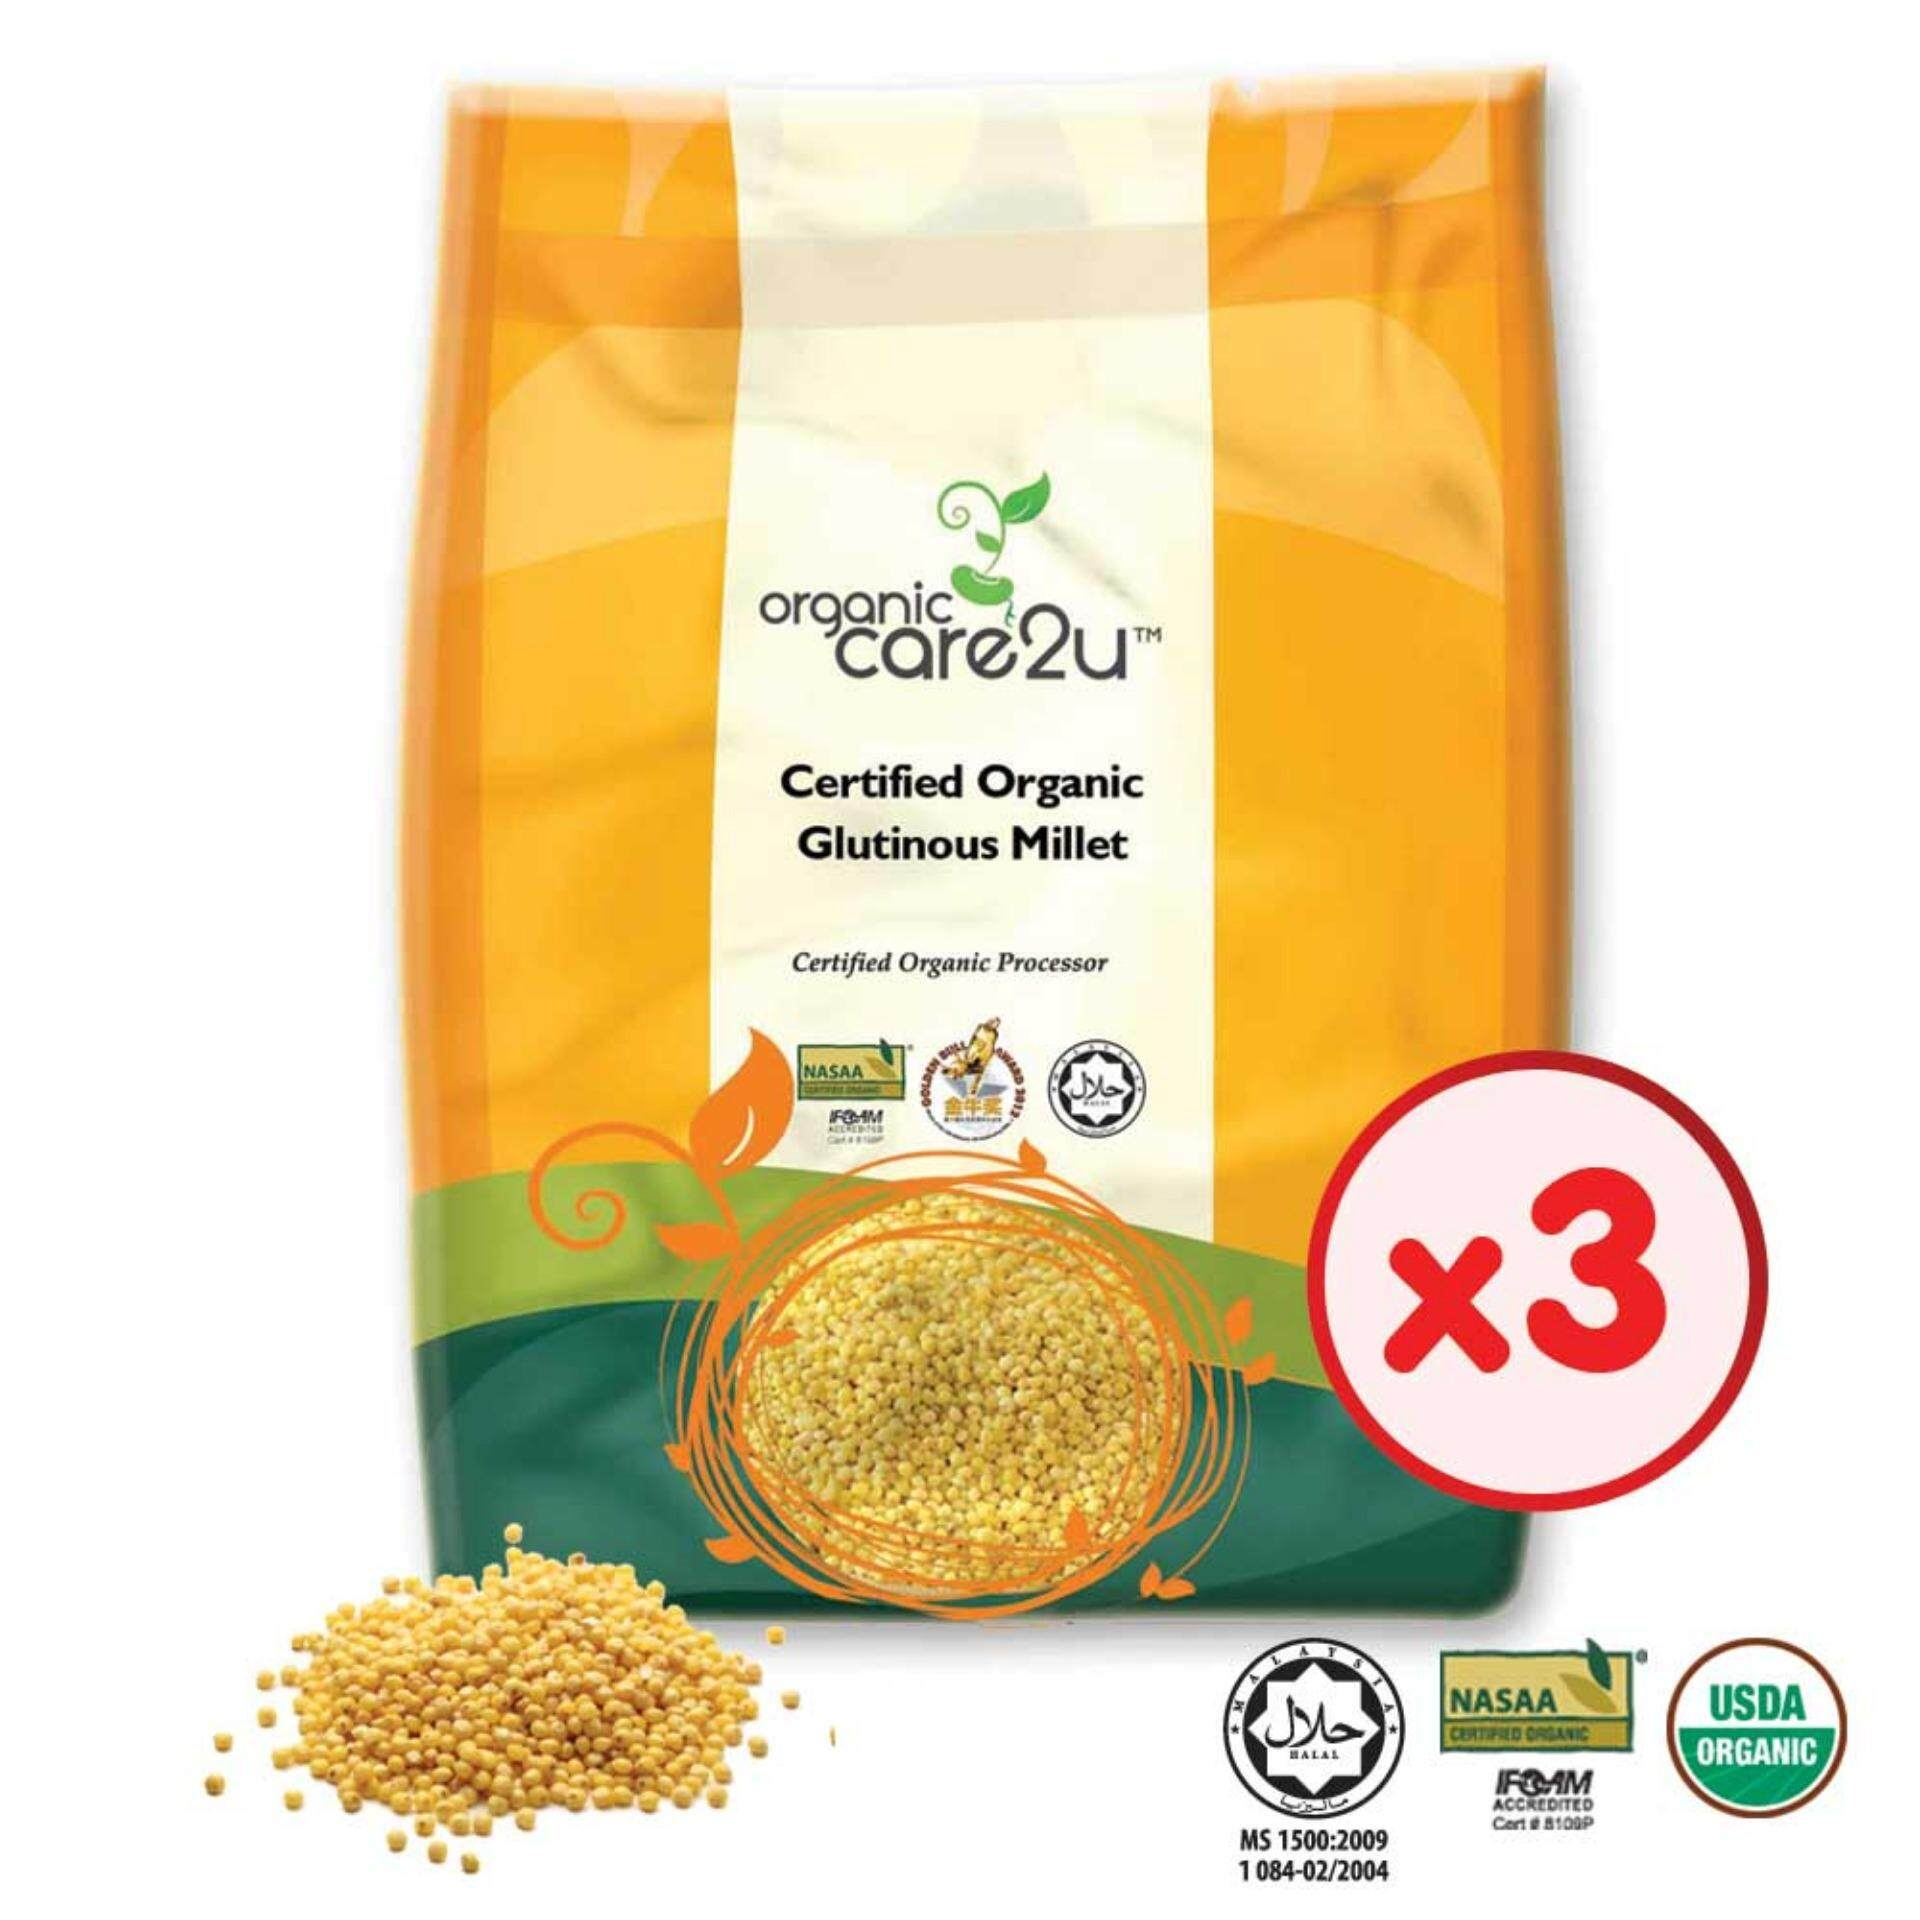 Organic Care2u Organic Glutinous Millet (400g) - [Bundle of 3]